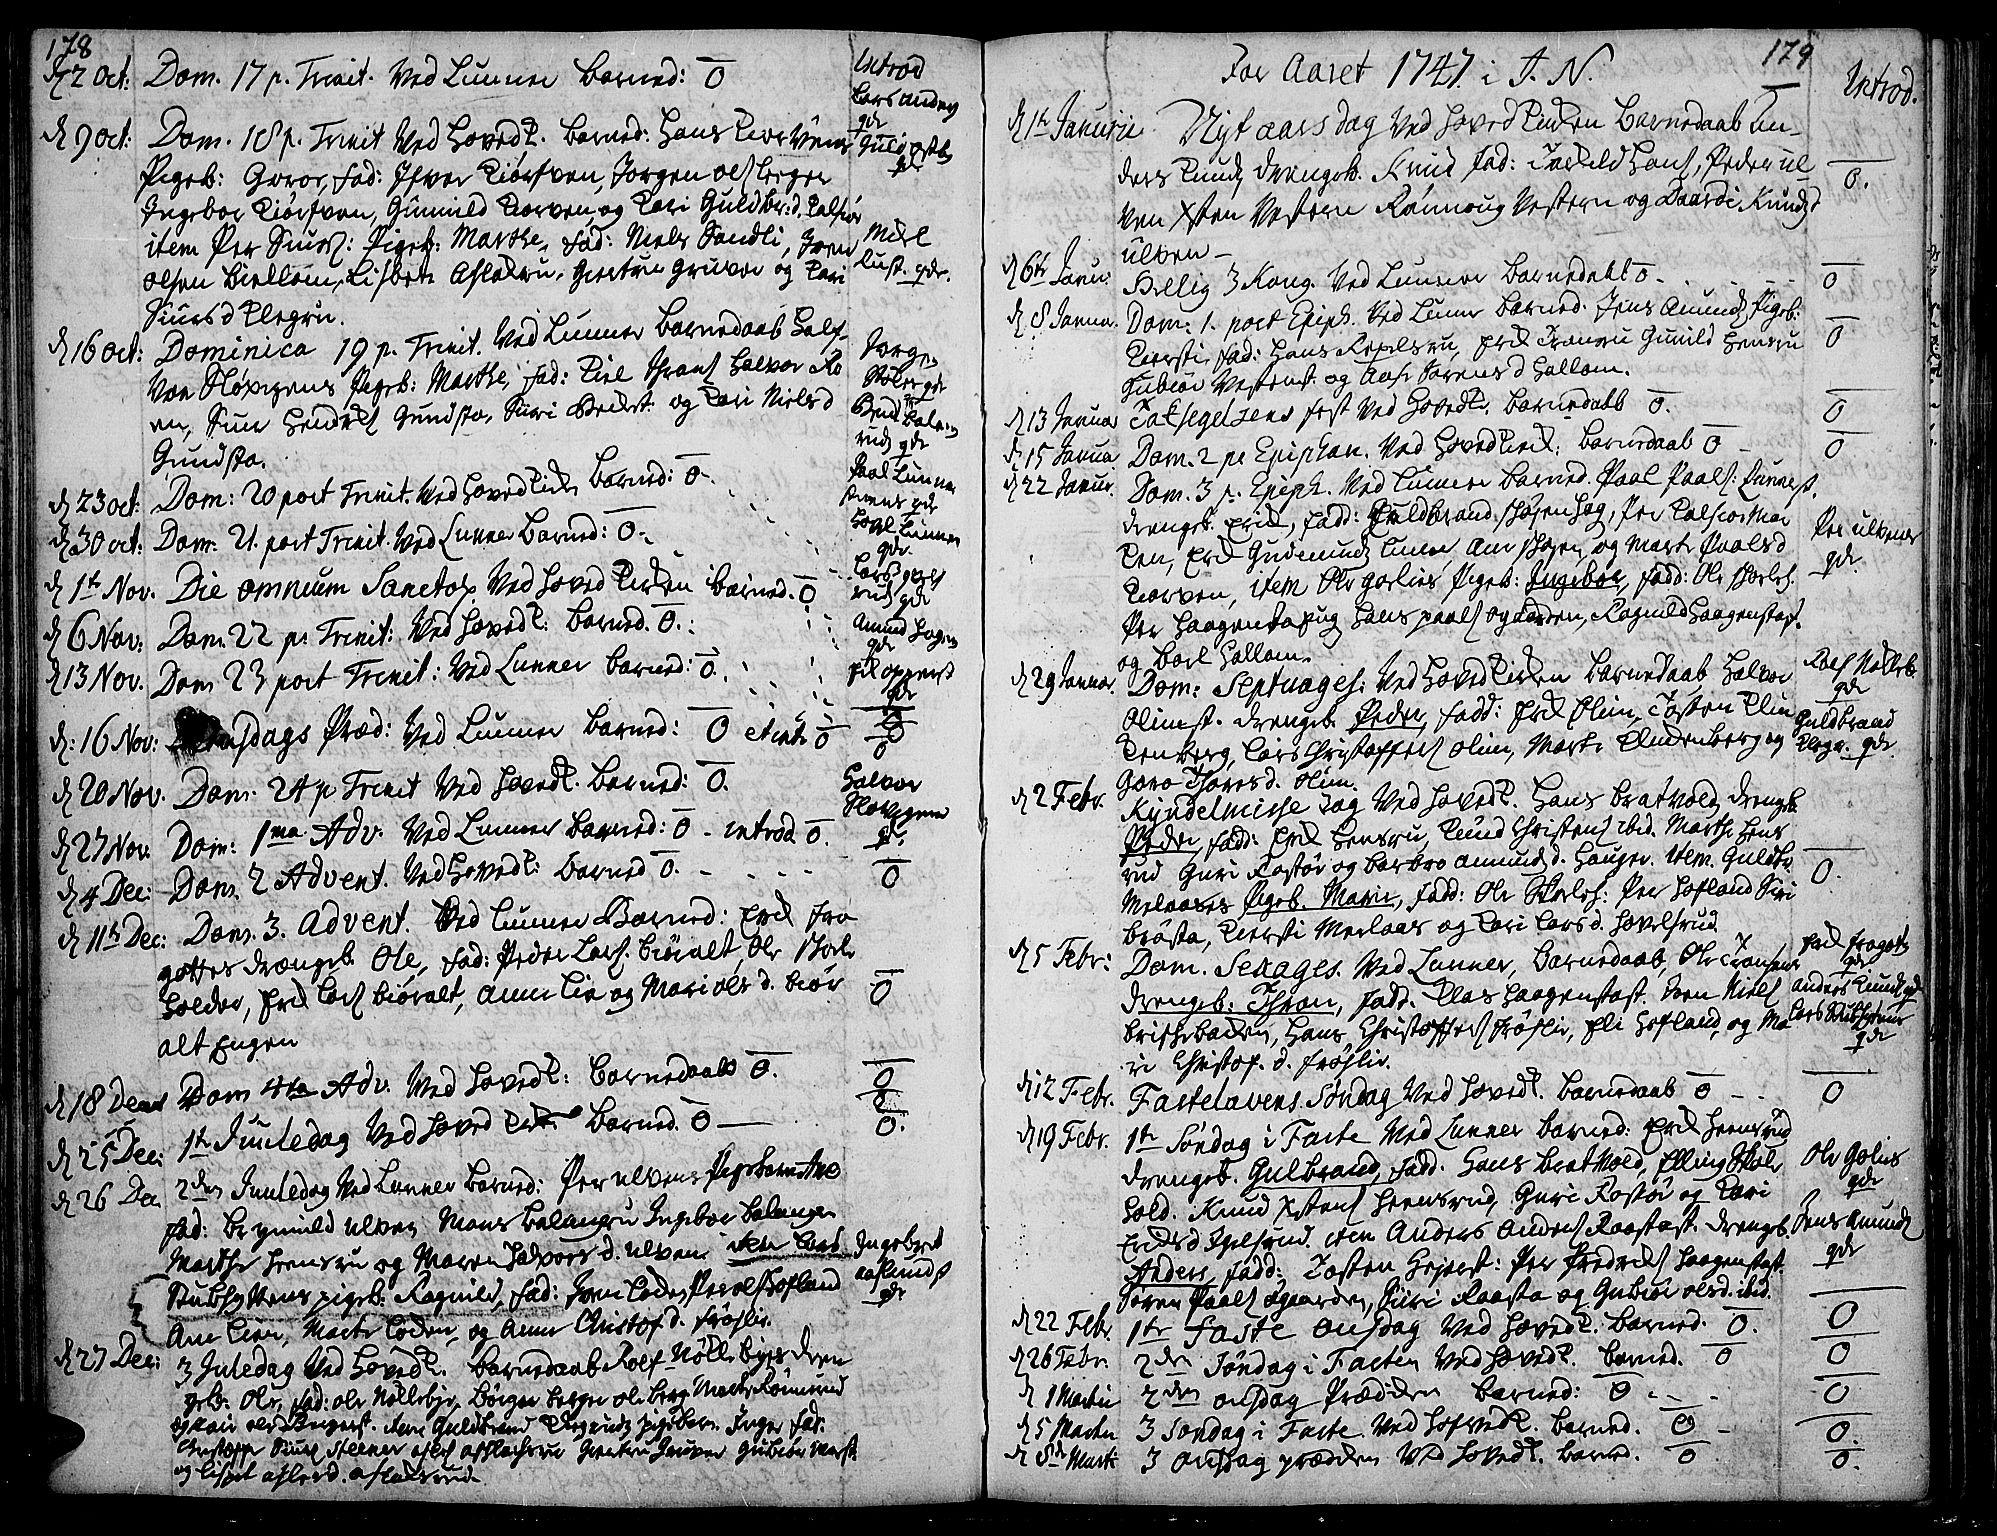 SAH, Jevnaker prestekontor, Ministerialbok nr. 2, 1725-1751, s. 178-179